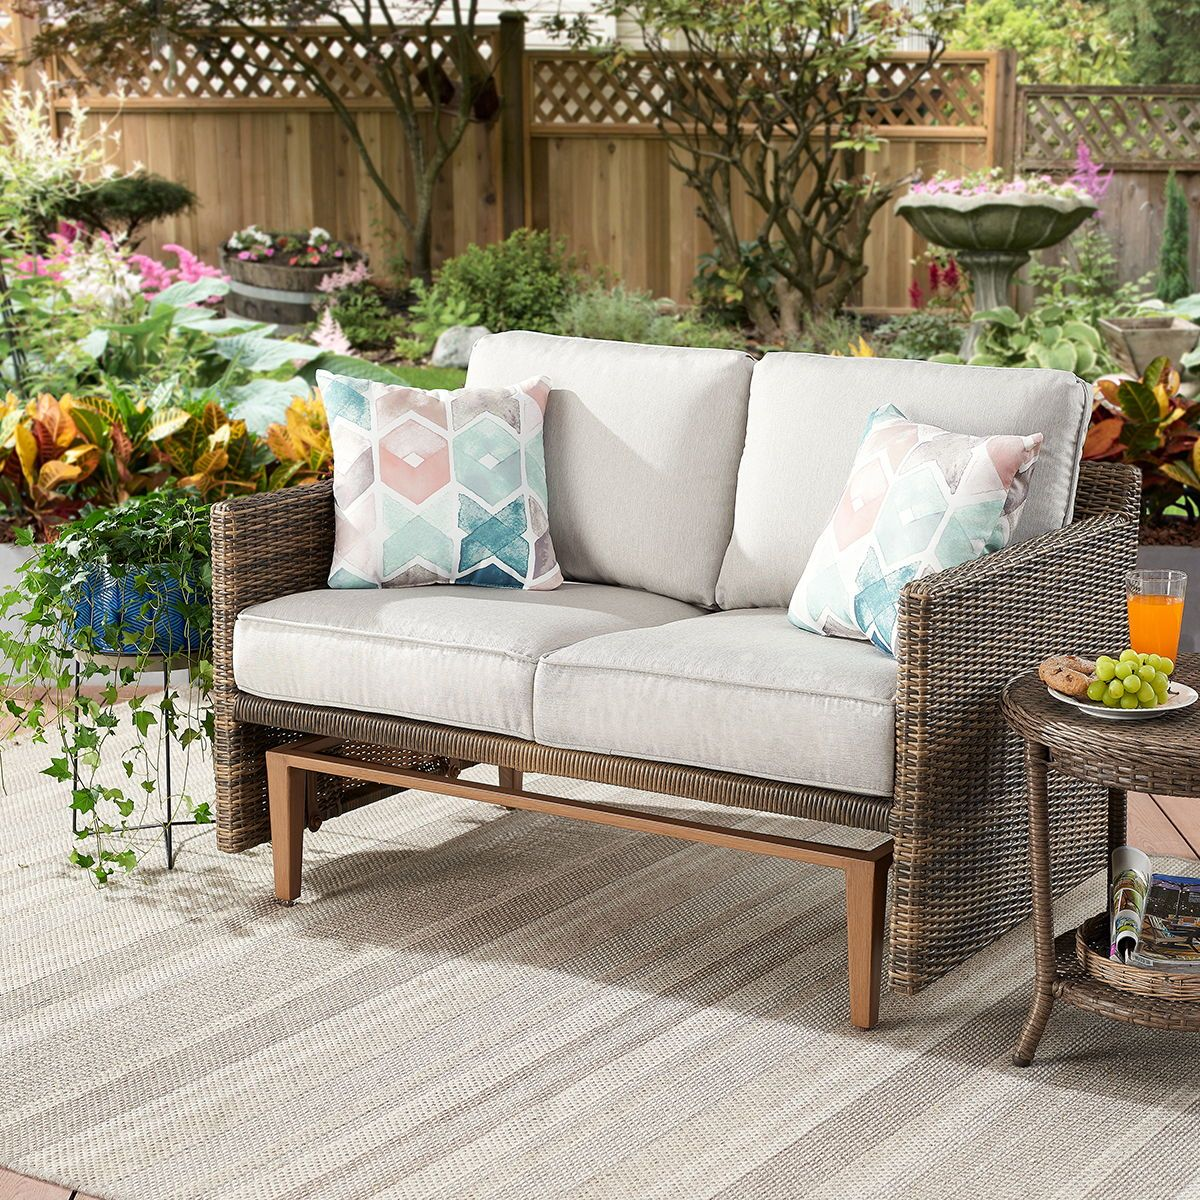 Better Homes Gardens Davenport Patio Wicker Glider Loveseat Walmart Com Love Seat Beige Cushions Better Homes Gardens